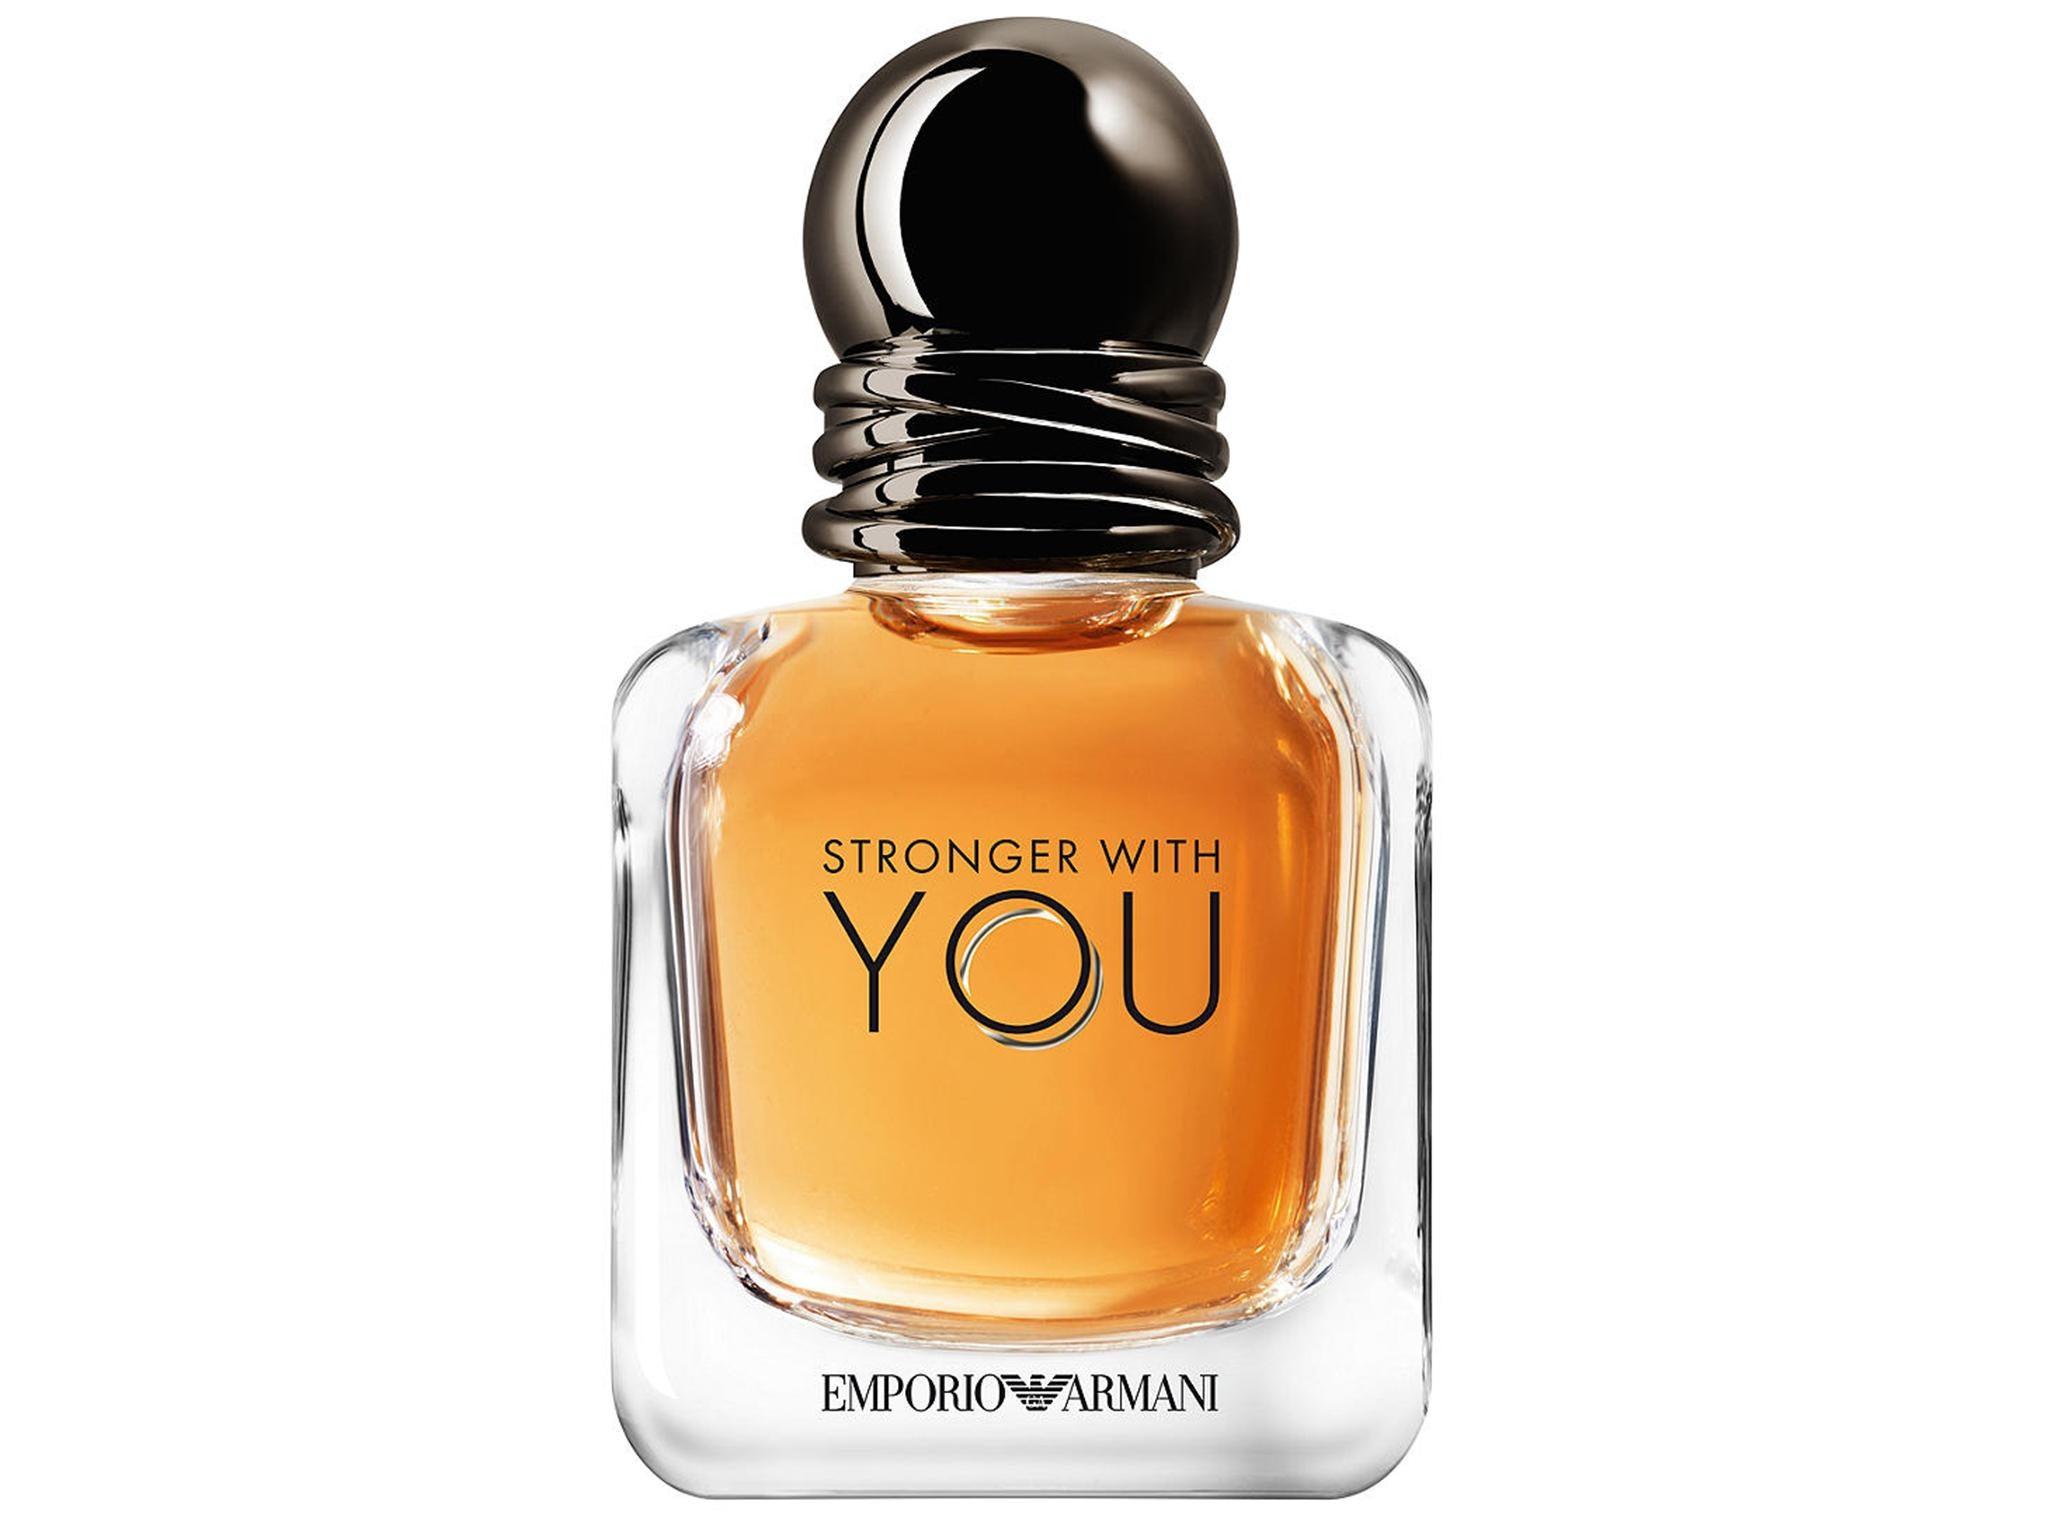 10 best men's fragrances for winter 2018/2019   The Independent